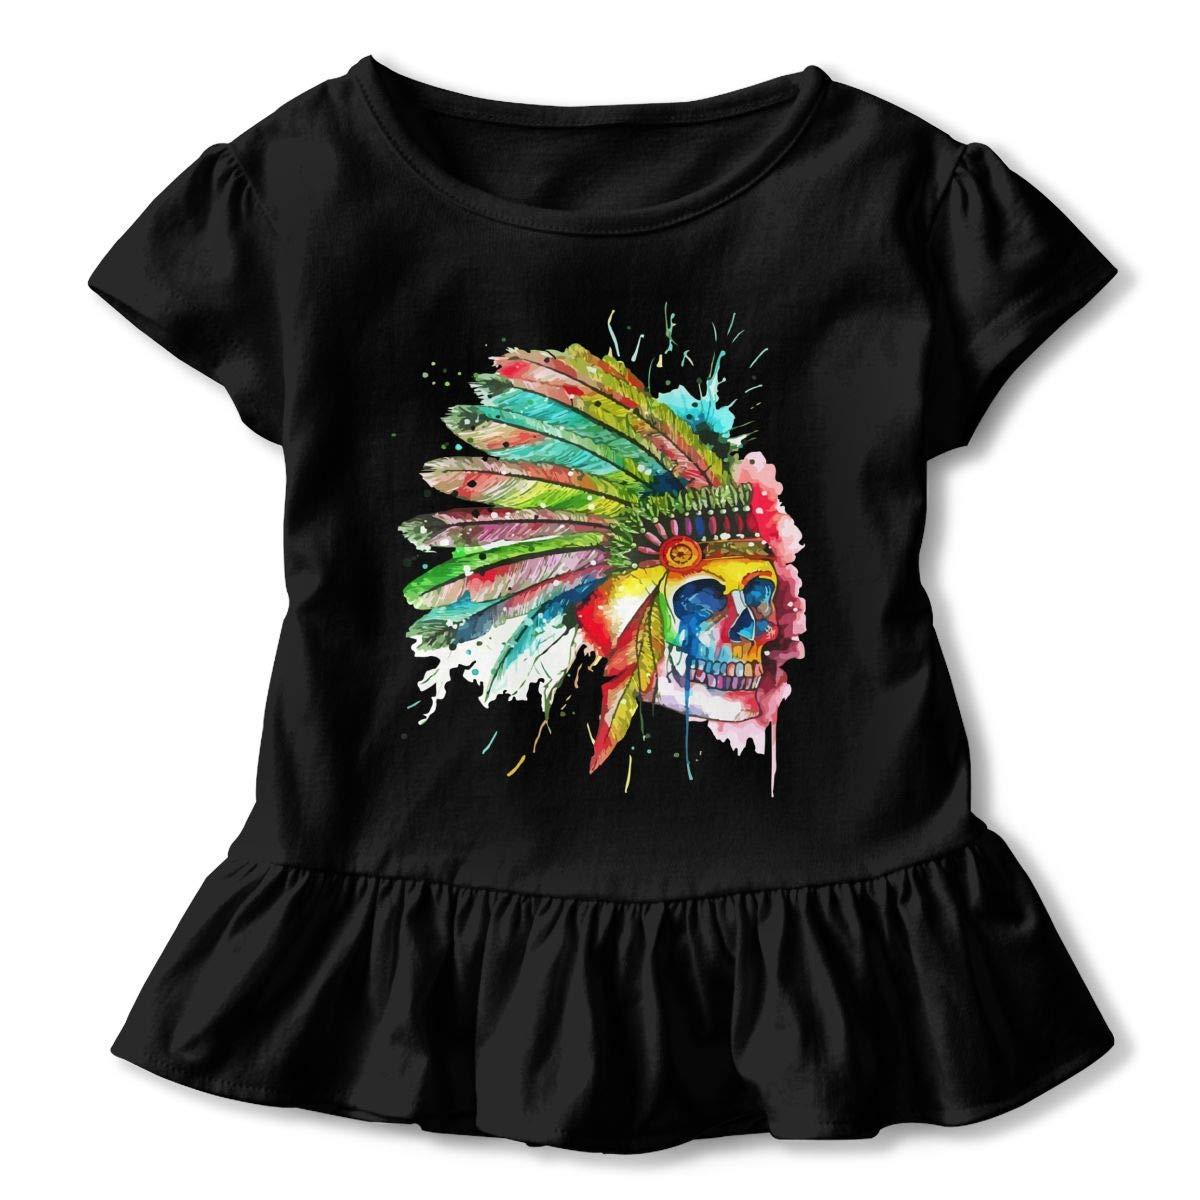 CZnuen American Indian Skull Baby Girls Round Neck Short Sleeve Ruffle T-Shirt Top